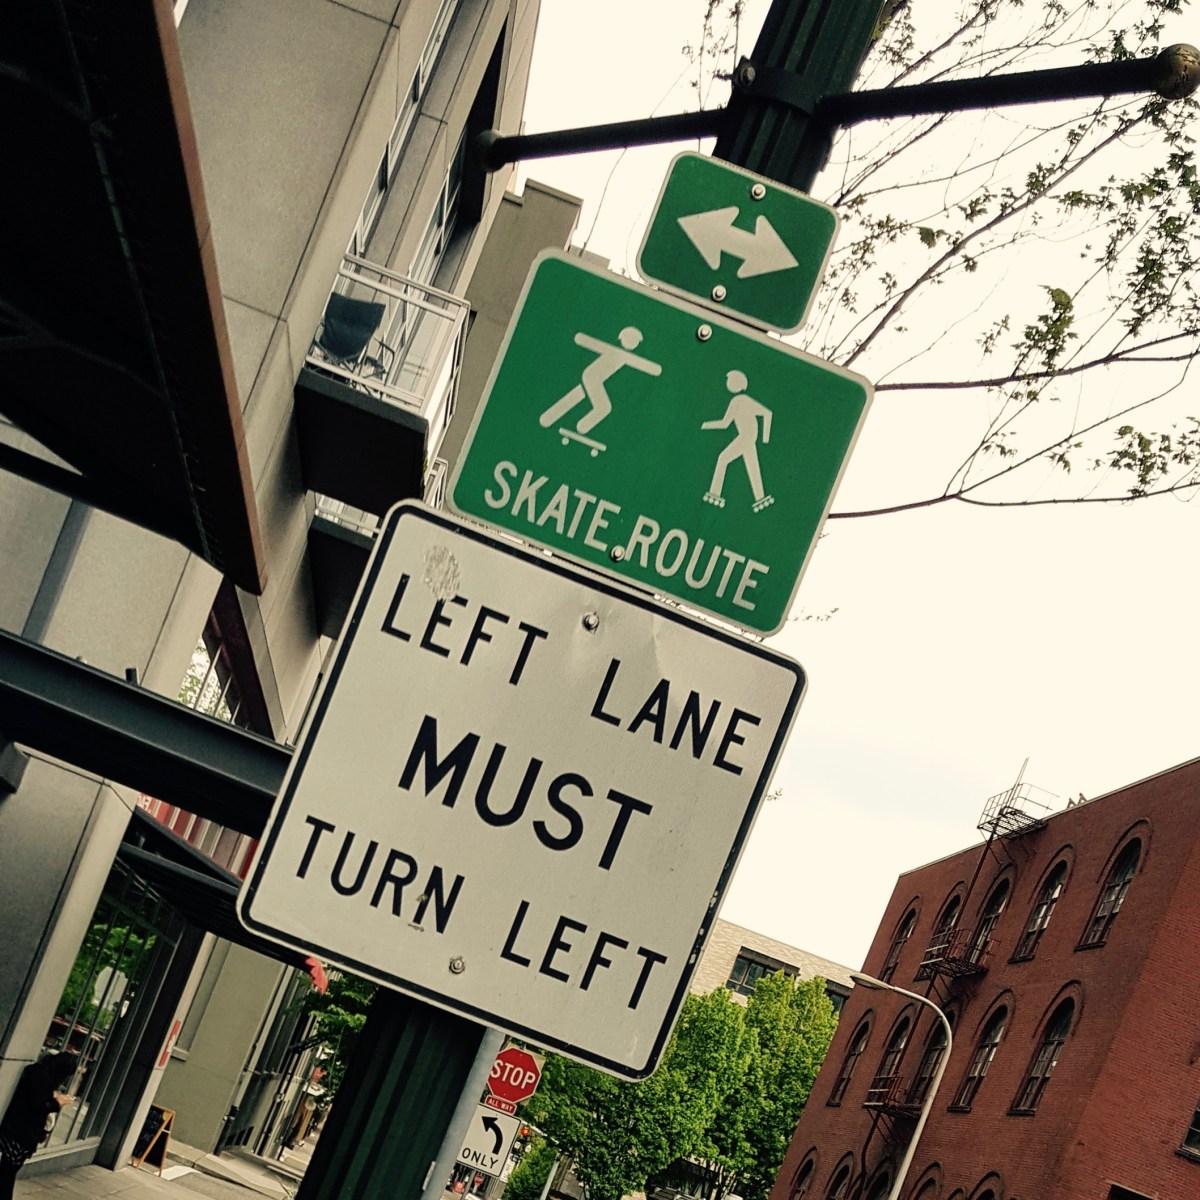 Skate Route